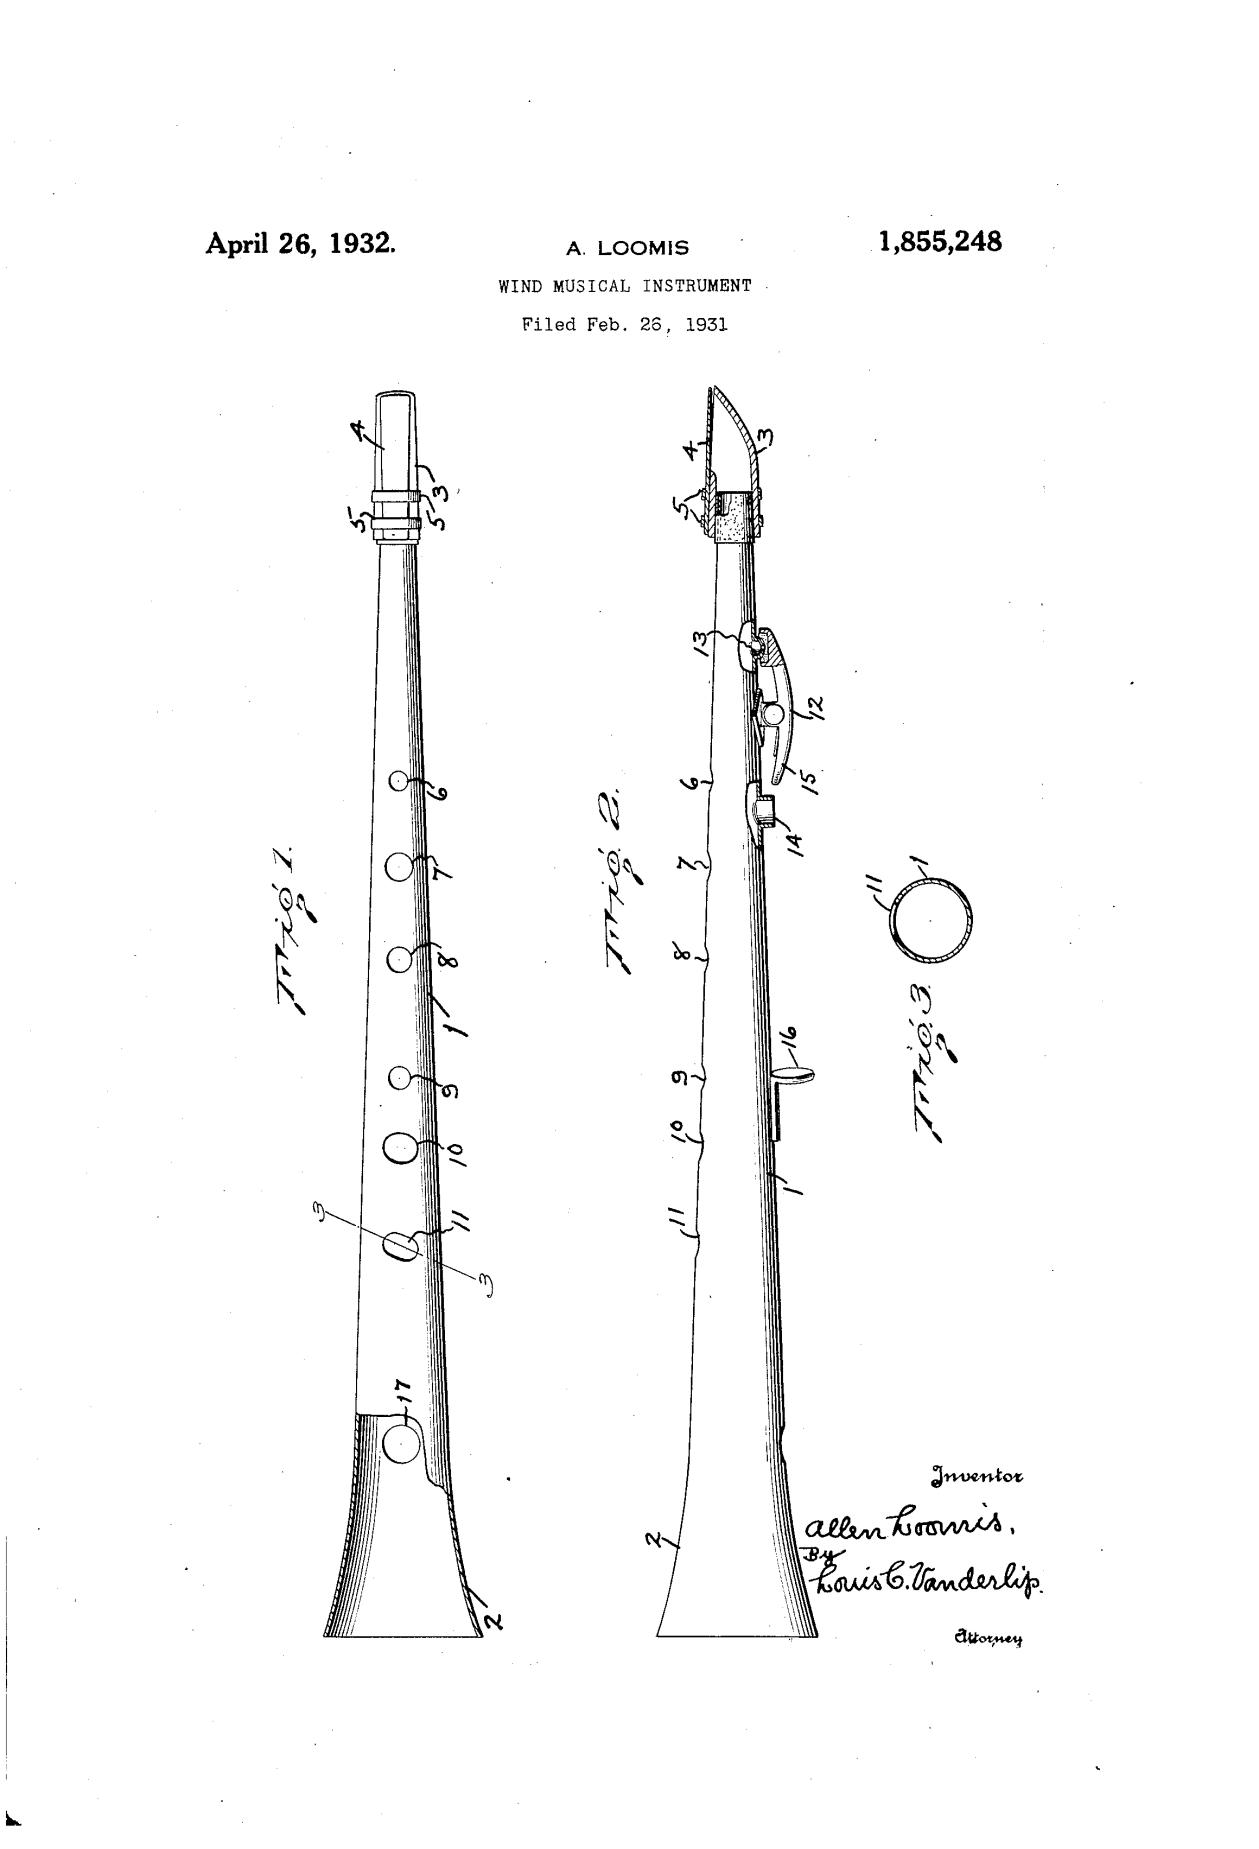 Clar-O-Sax patent drawing, A. Loomis, April 26, 1932, 1,855,248